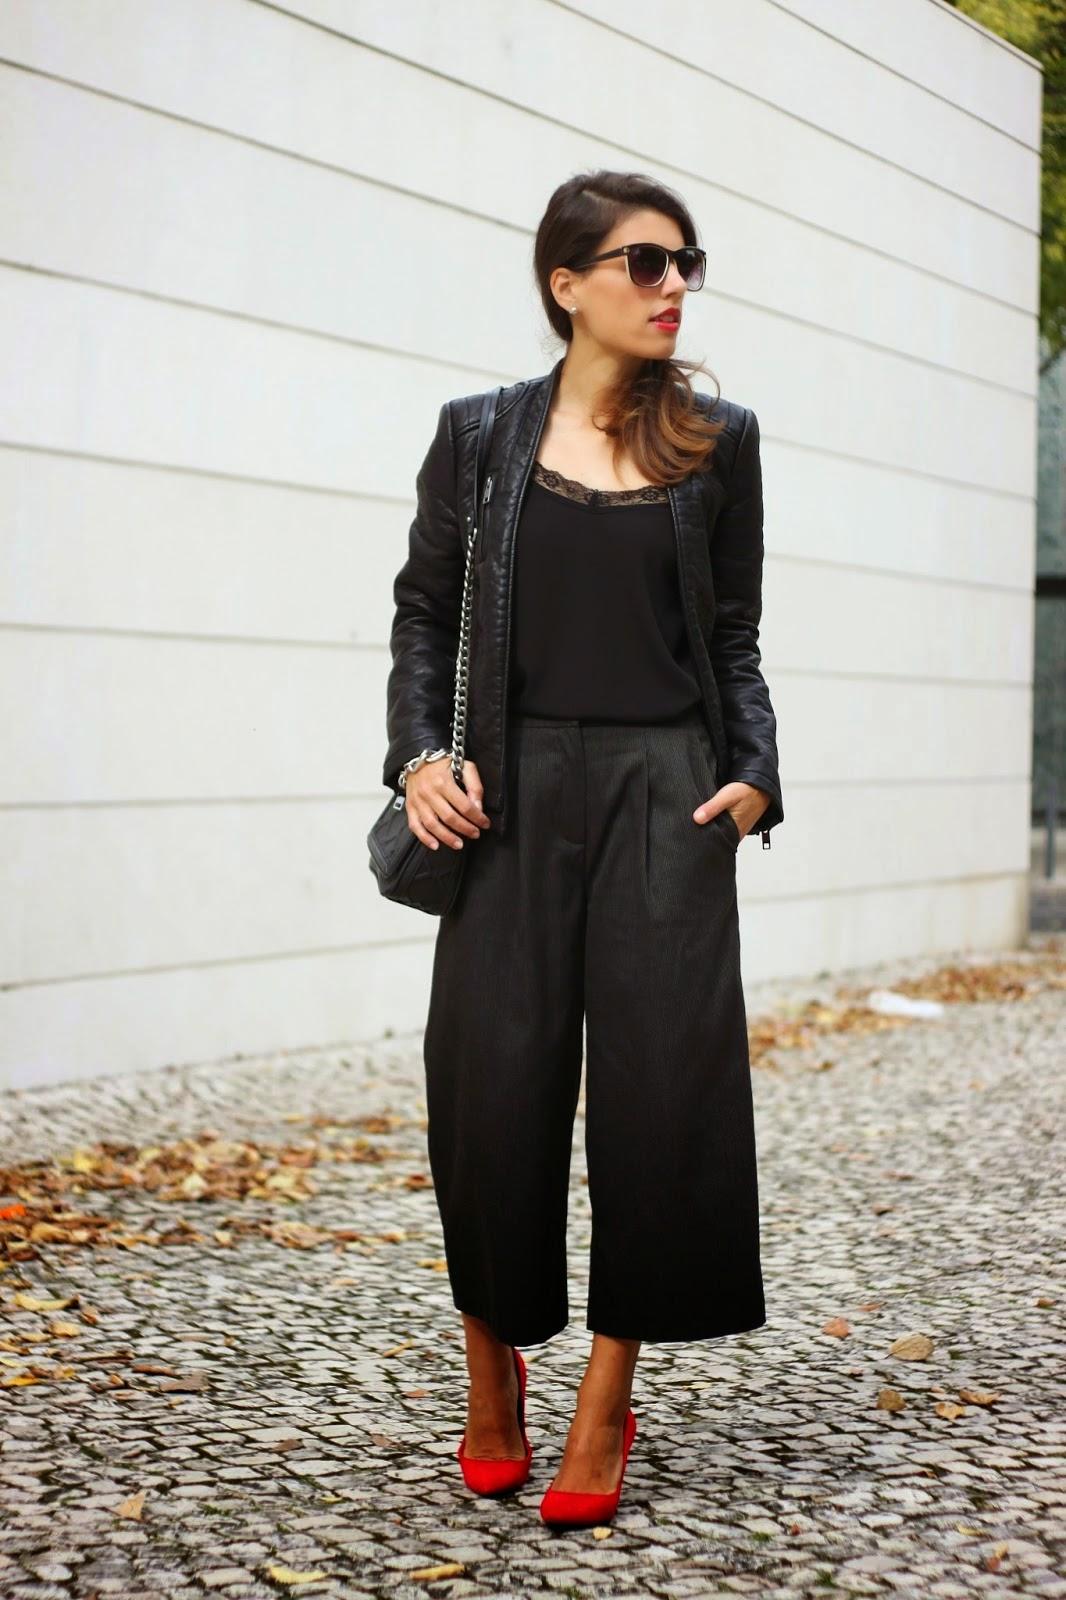 http://ilovefitametrica.blogspot.pt/2014/11/grey-culottes.html